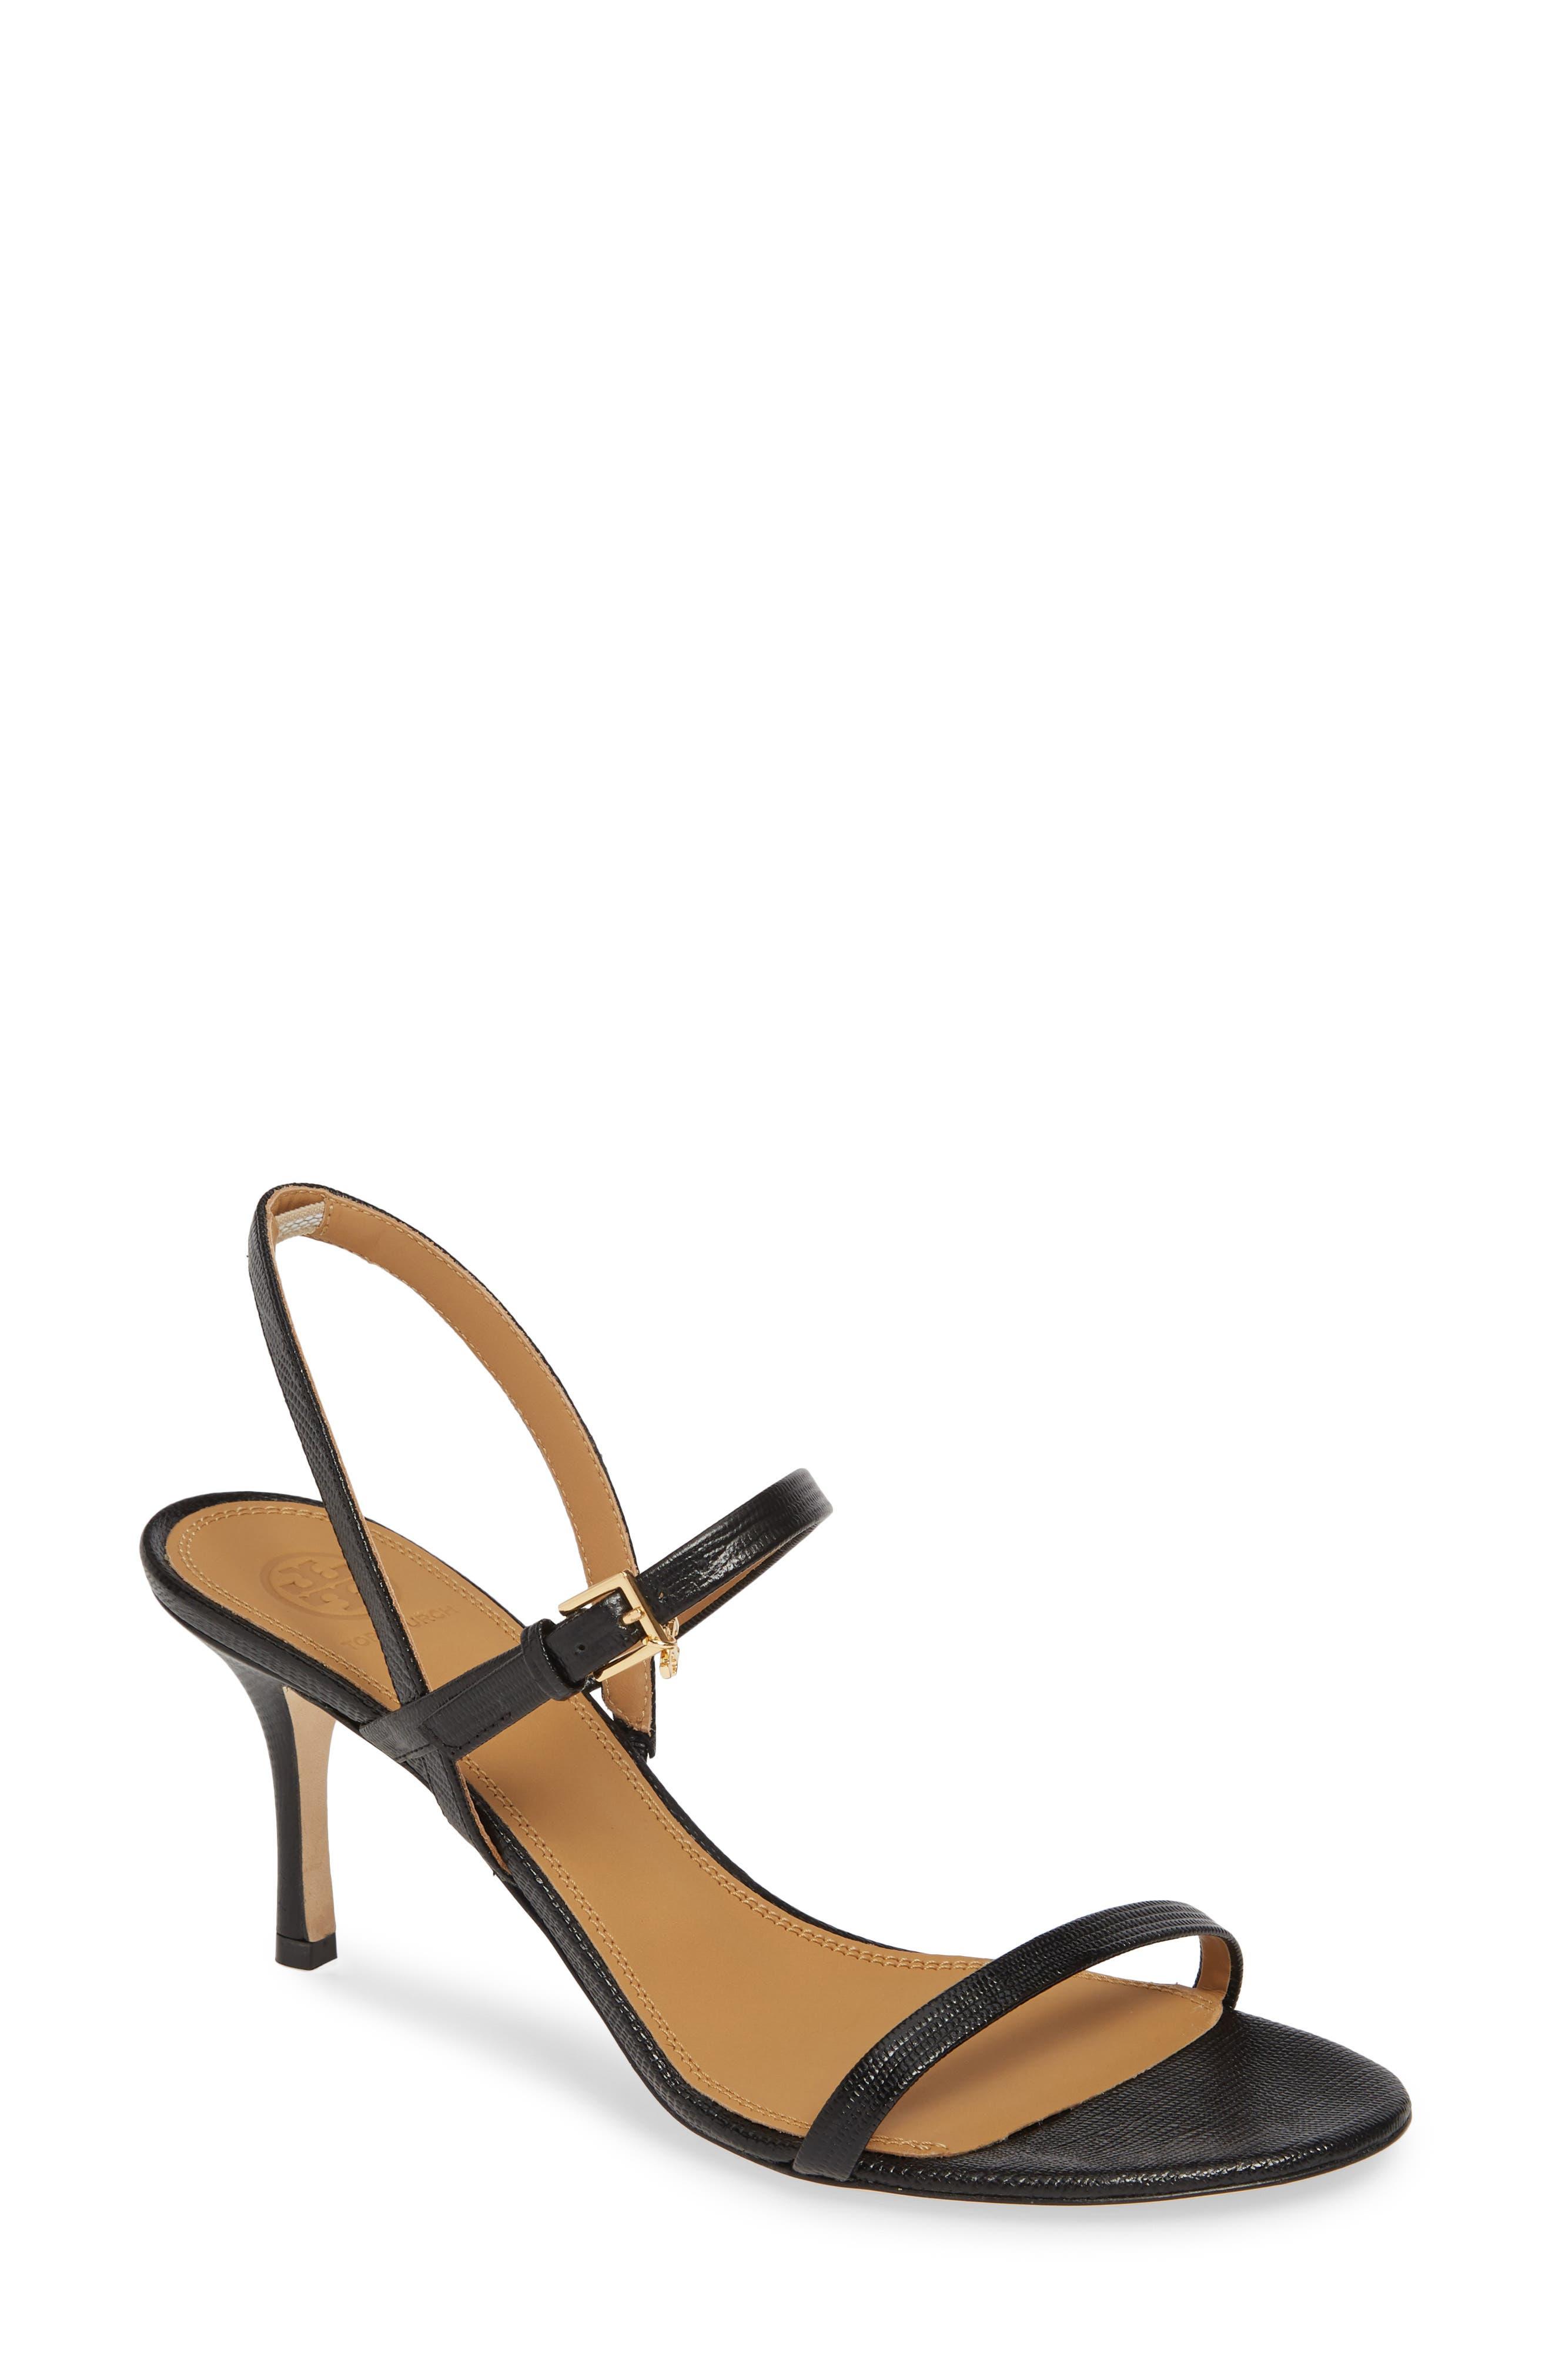 Tory Burch Penelope Slingback Sandal (Women)